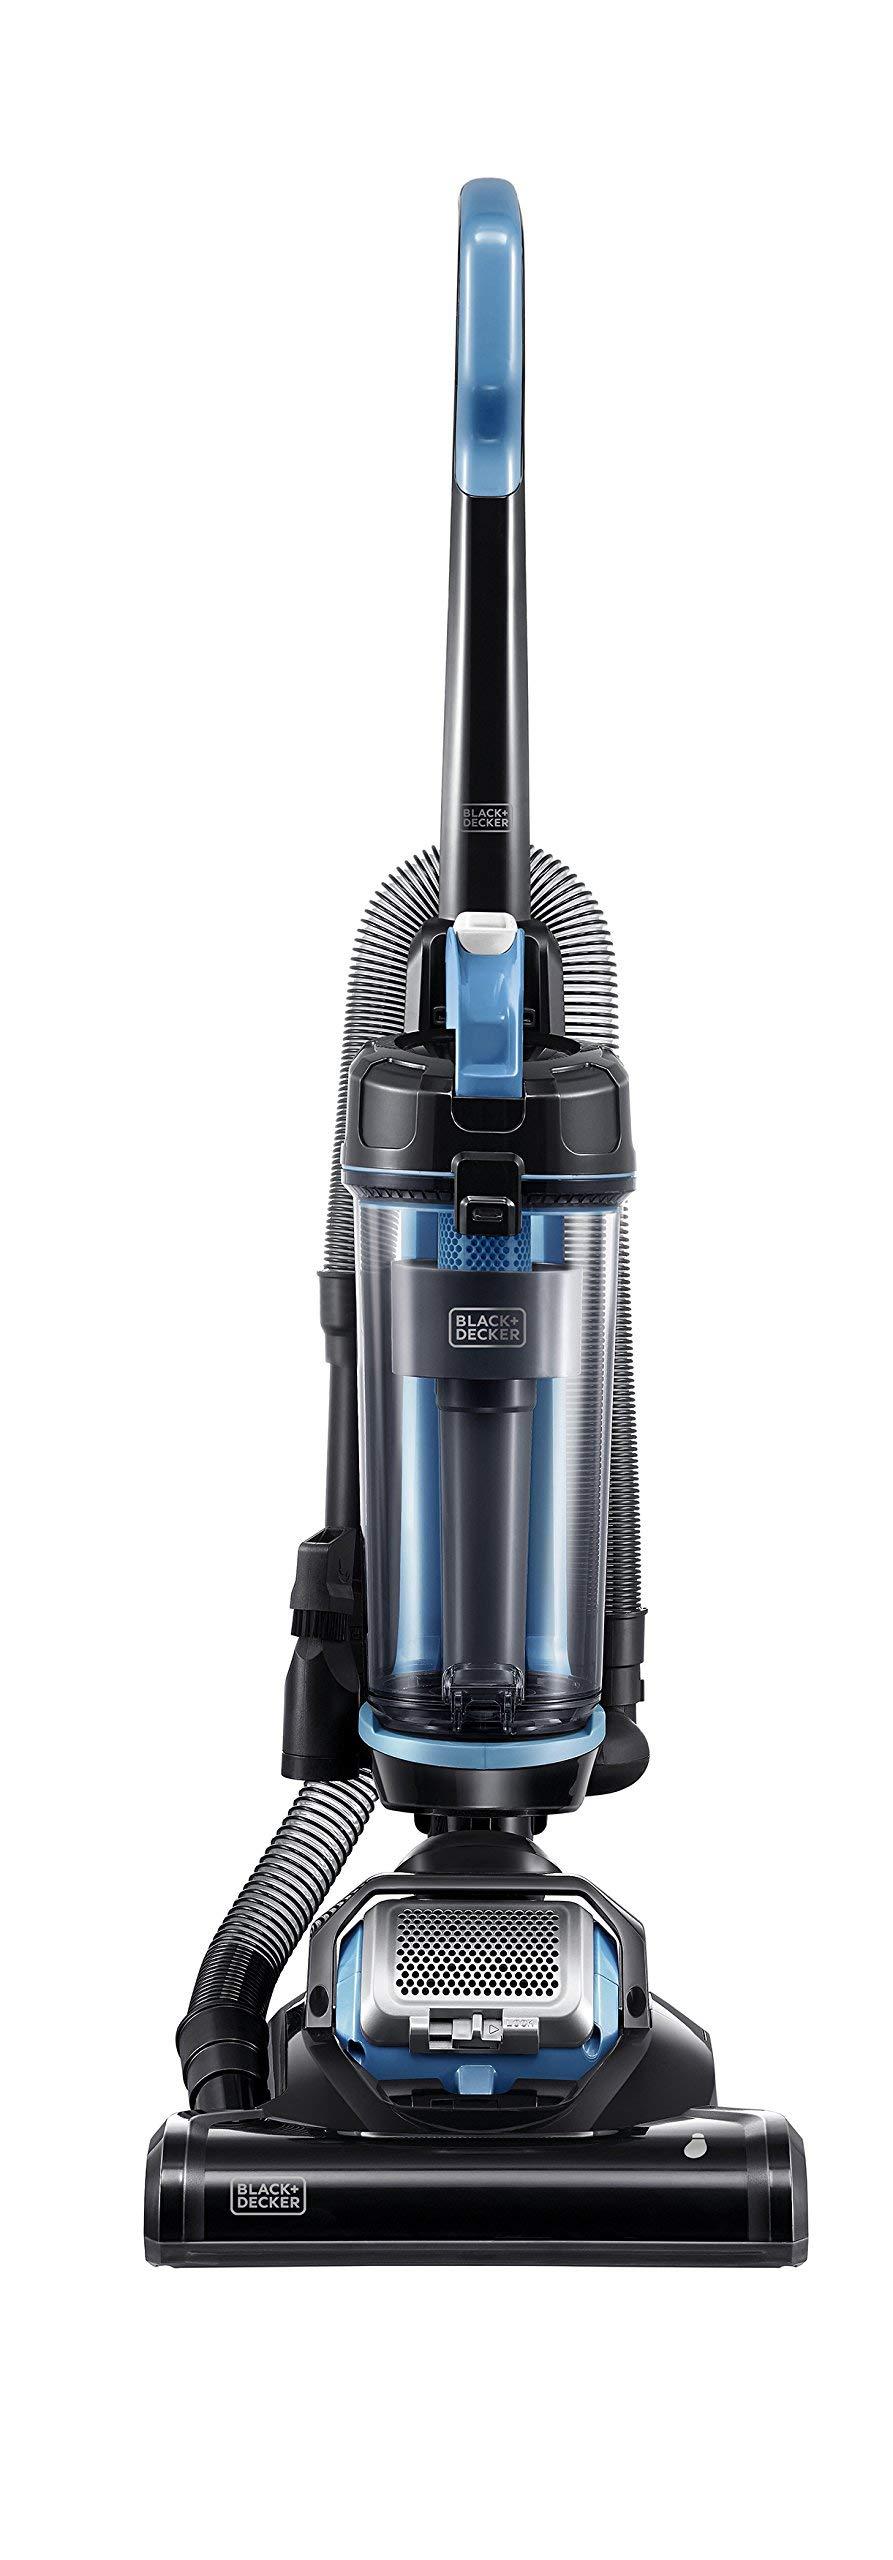 Black & Decker BDASL202 AIRSWIVEL Light Weight, Lite Ultra Lightweight Upright Vacuum Cleaner, Blue (Renewed) by BLACK+DECKER